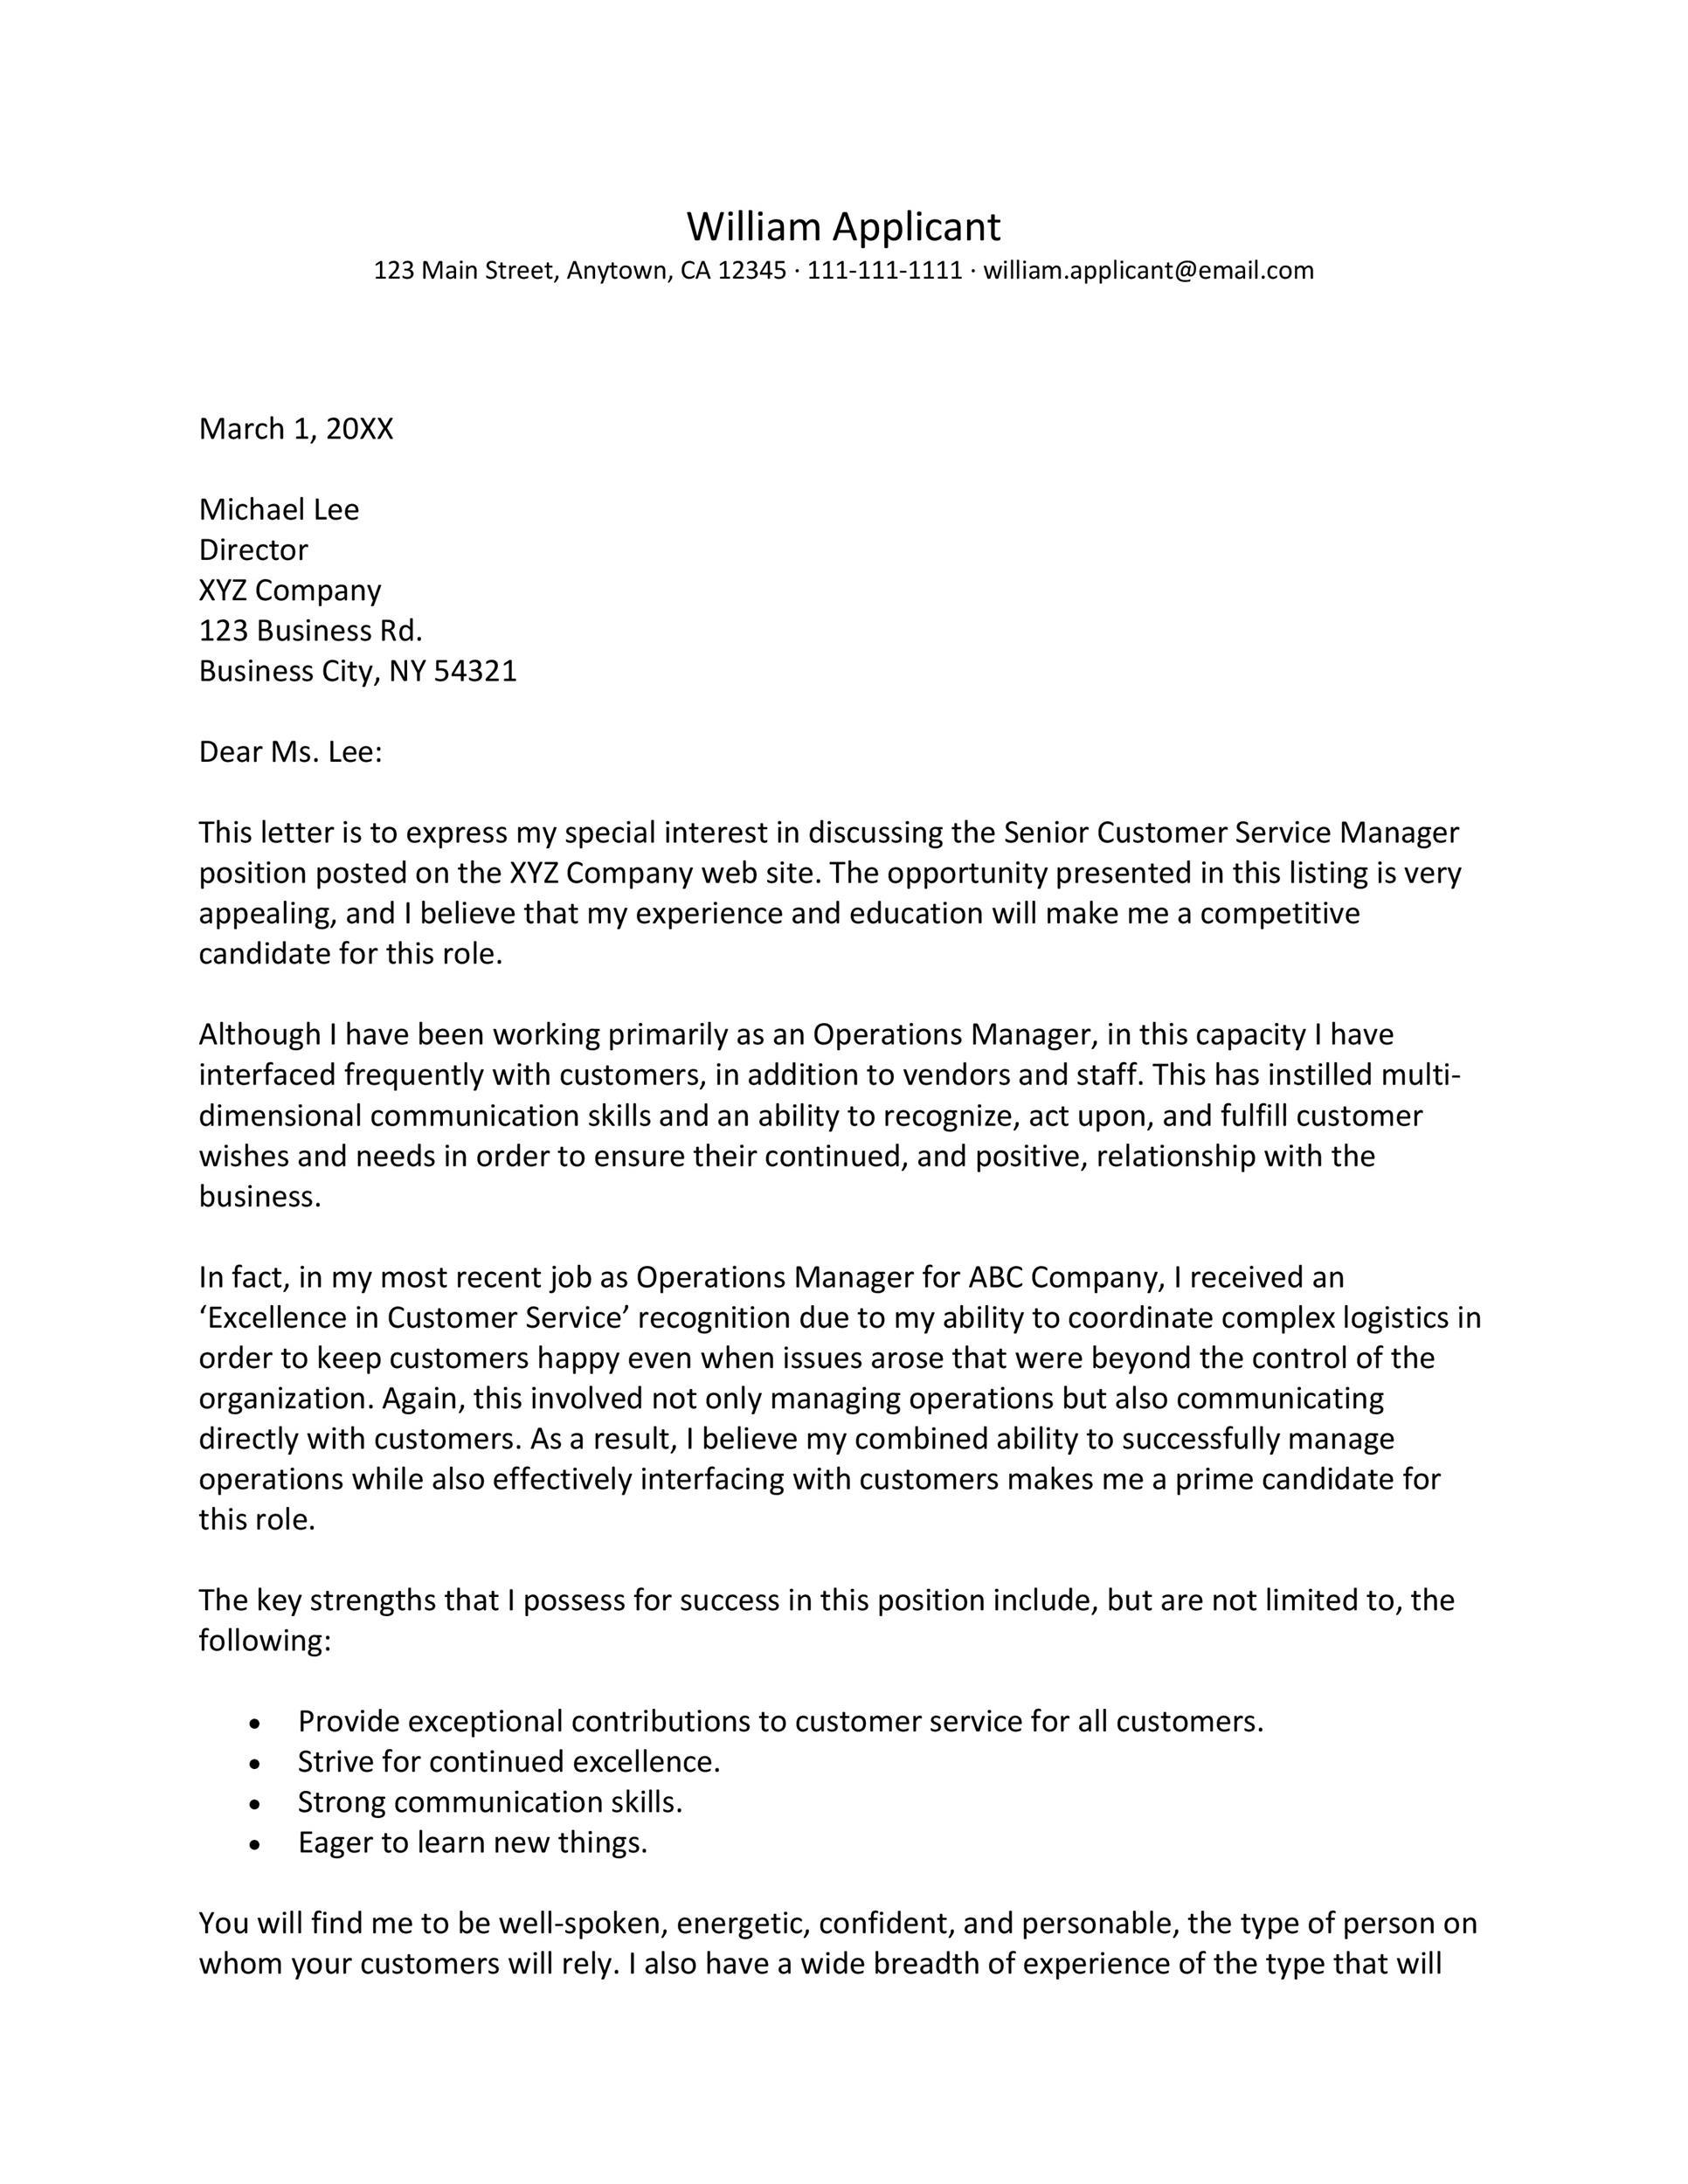 Free career change cover letter 05